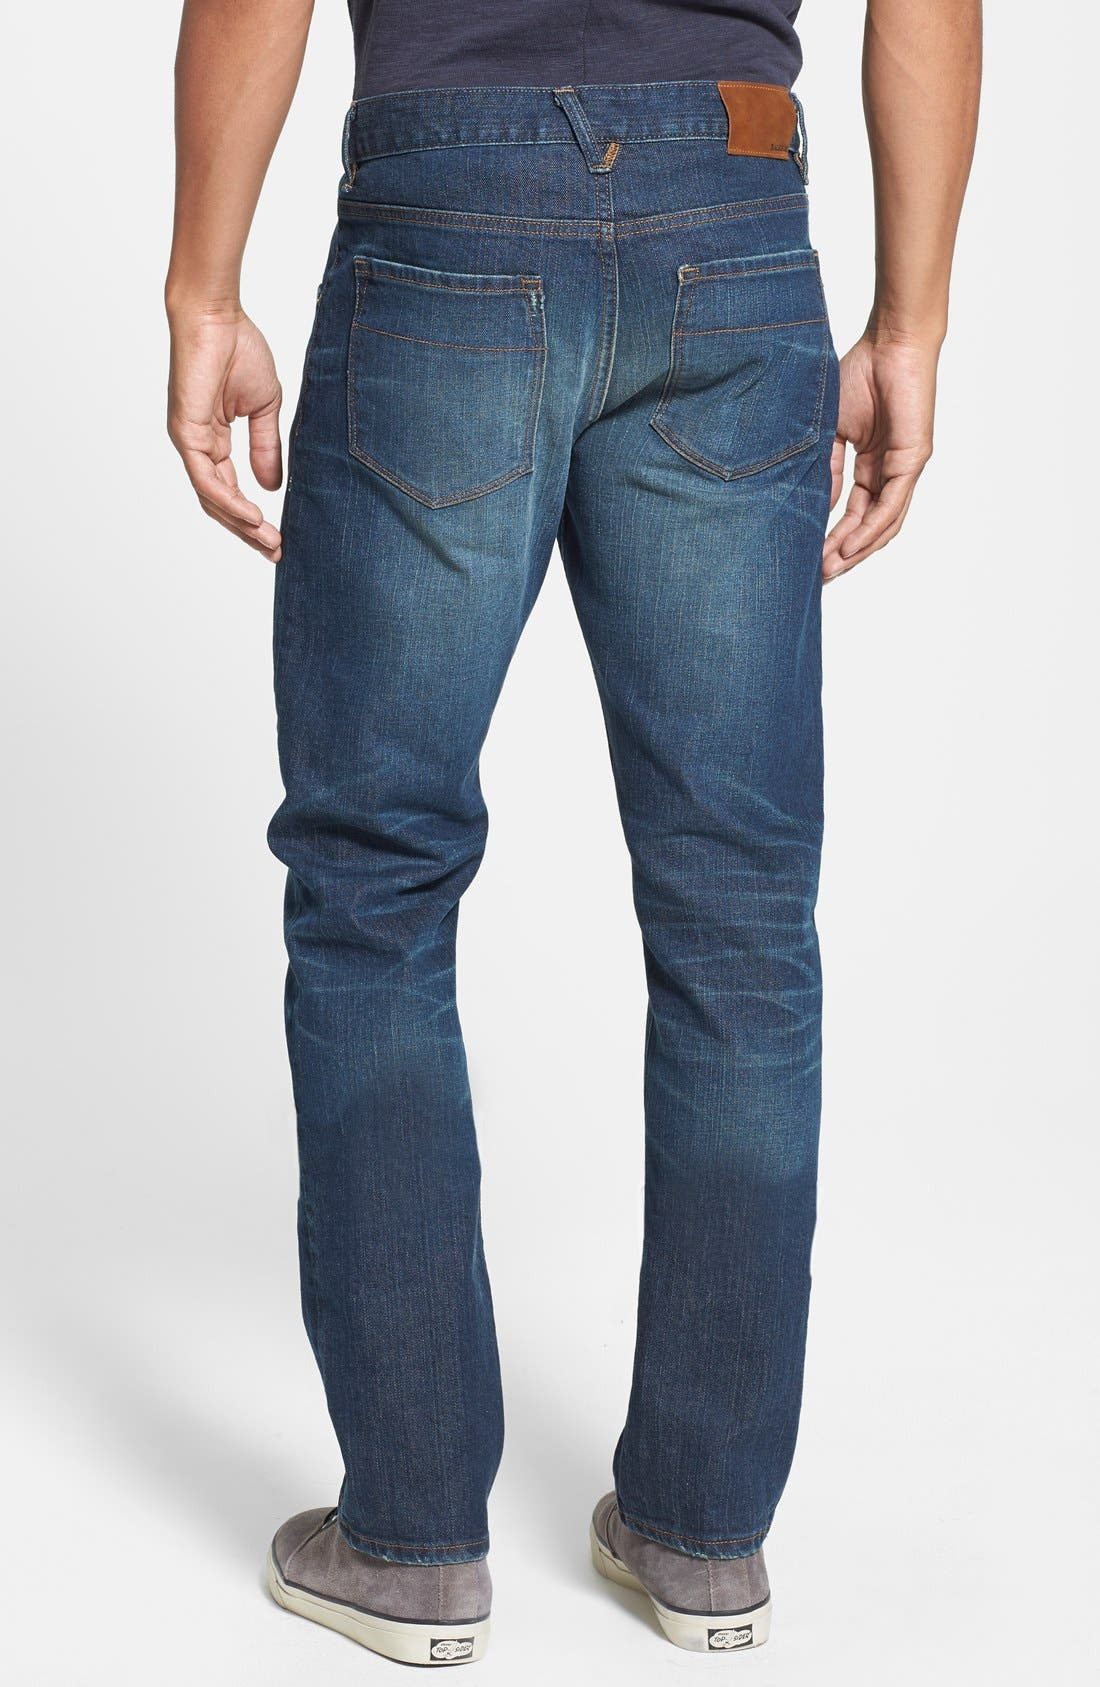 'Jones' Slim Straight Fit Jeans,                             Alternate thumbnail 2, color,                             Camp